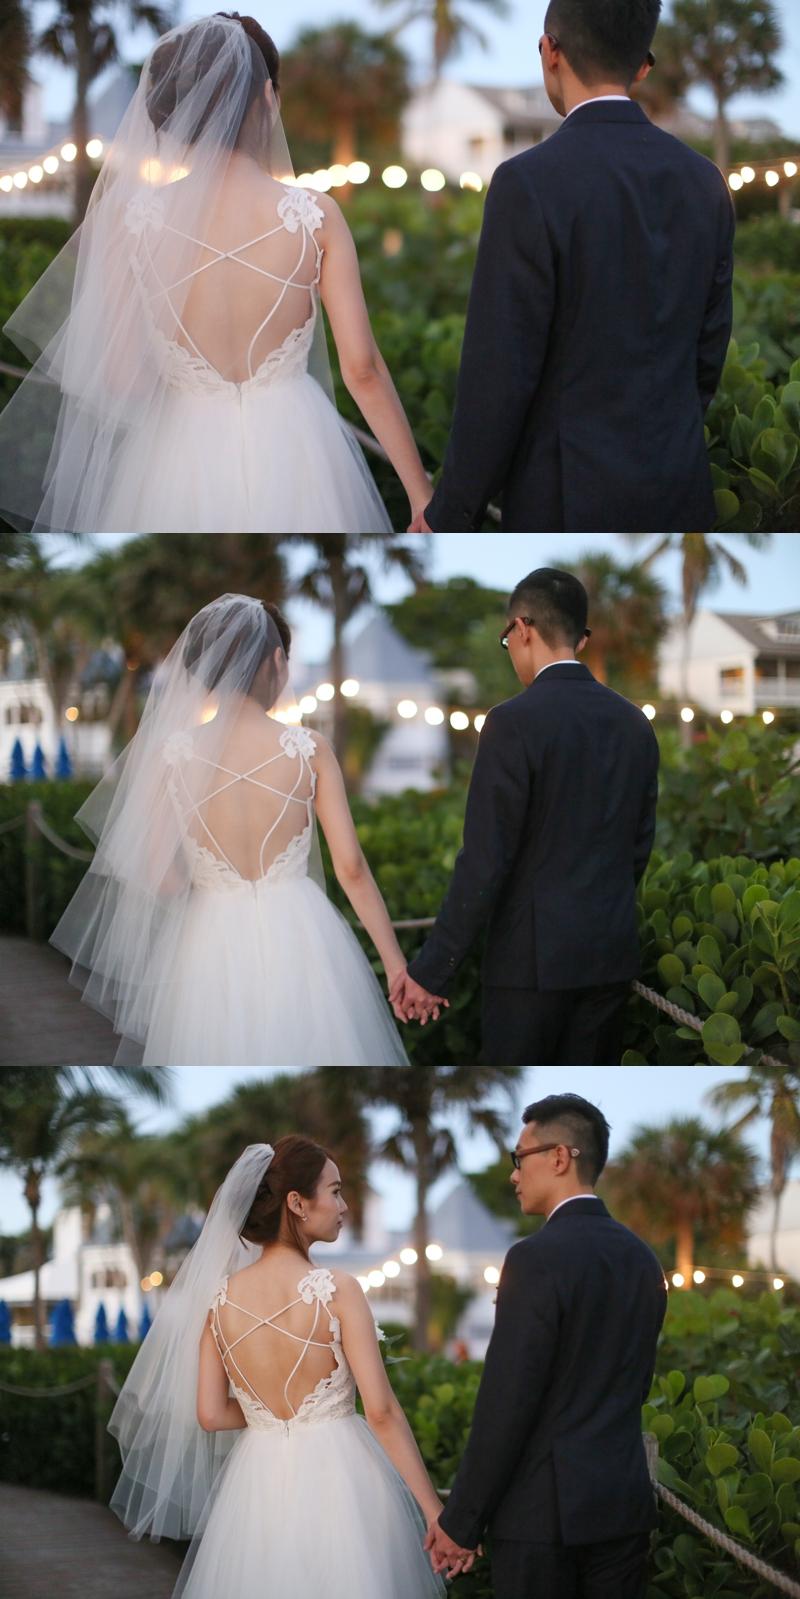 audreysnow-photography-casa-ybel-wedding_4576.jpg